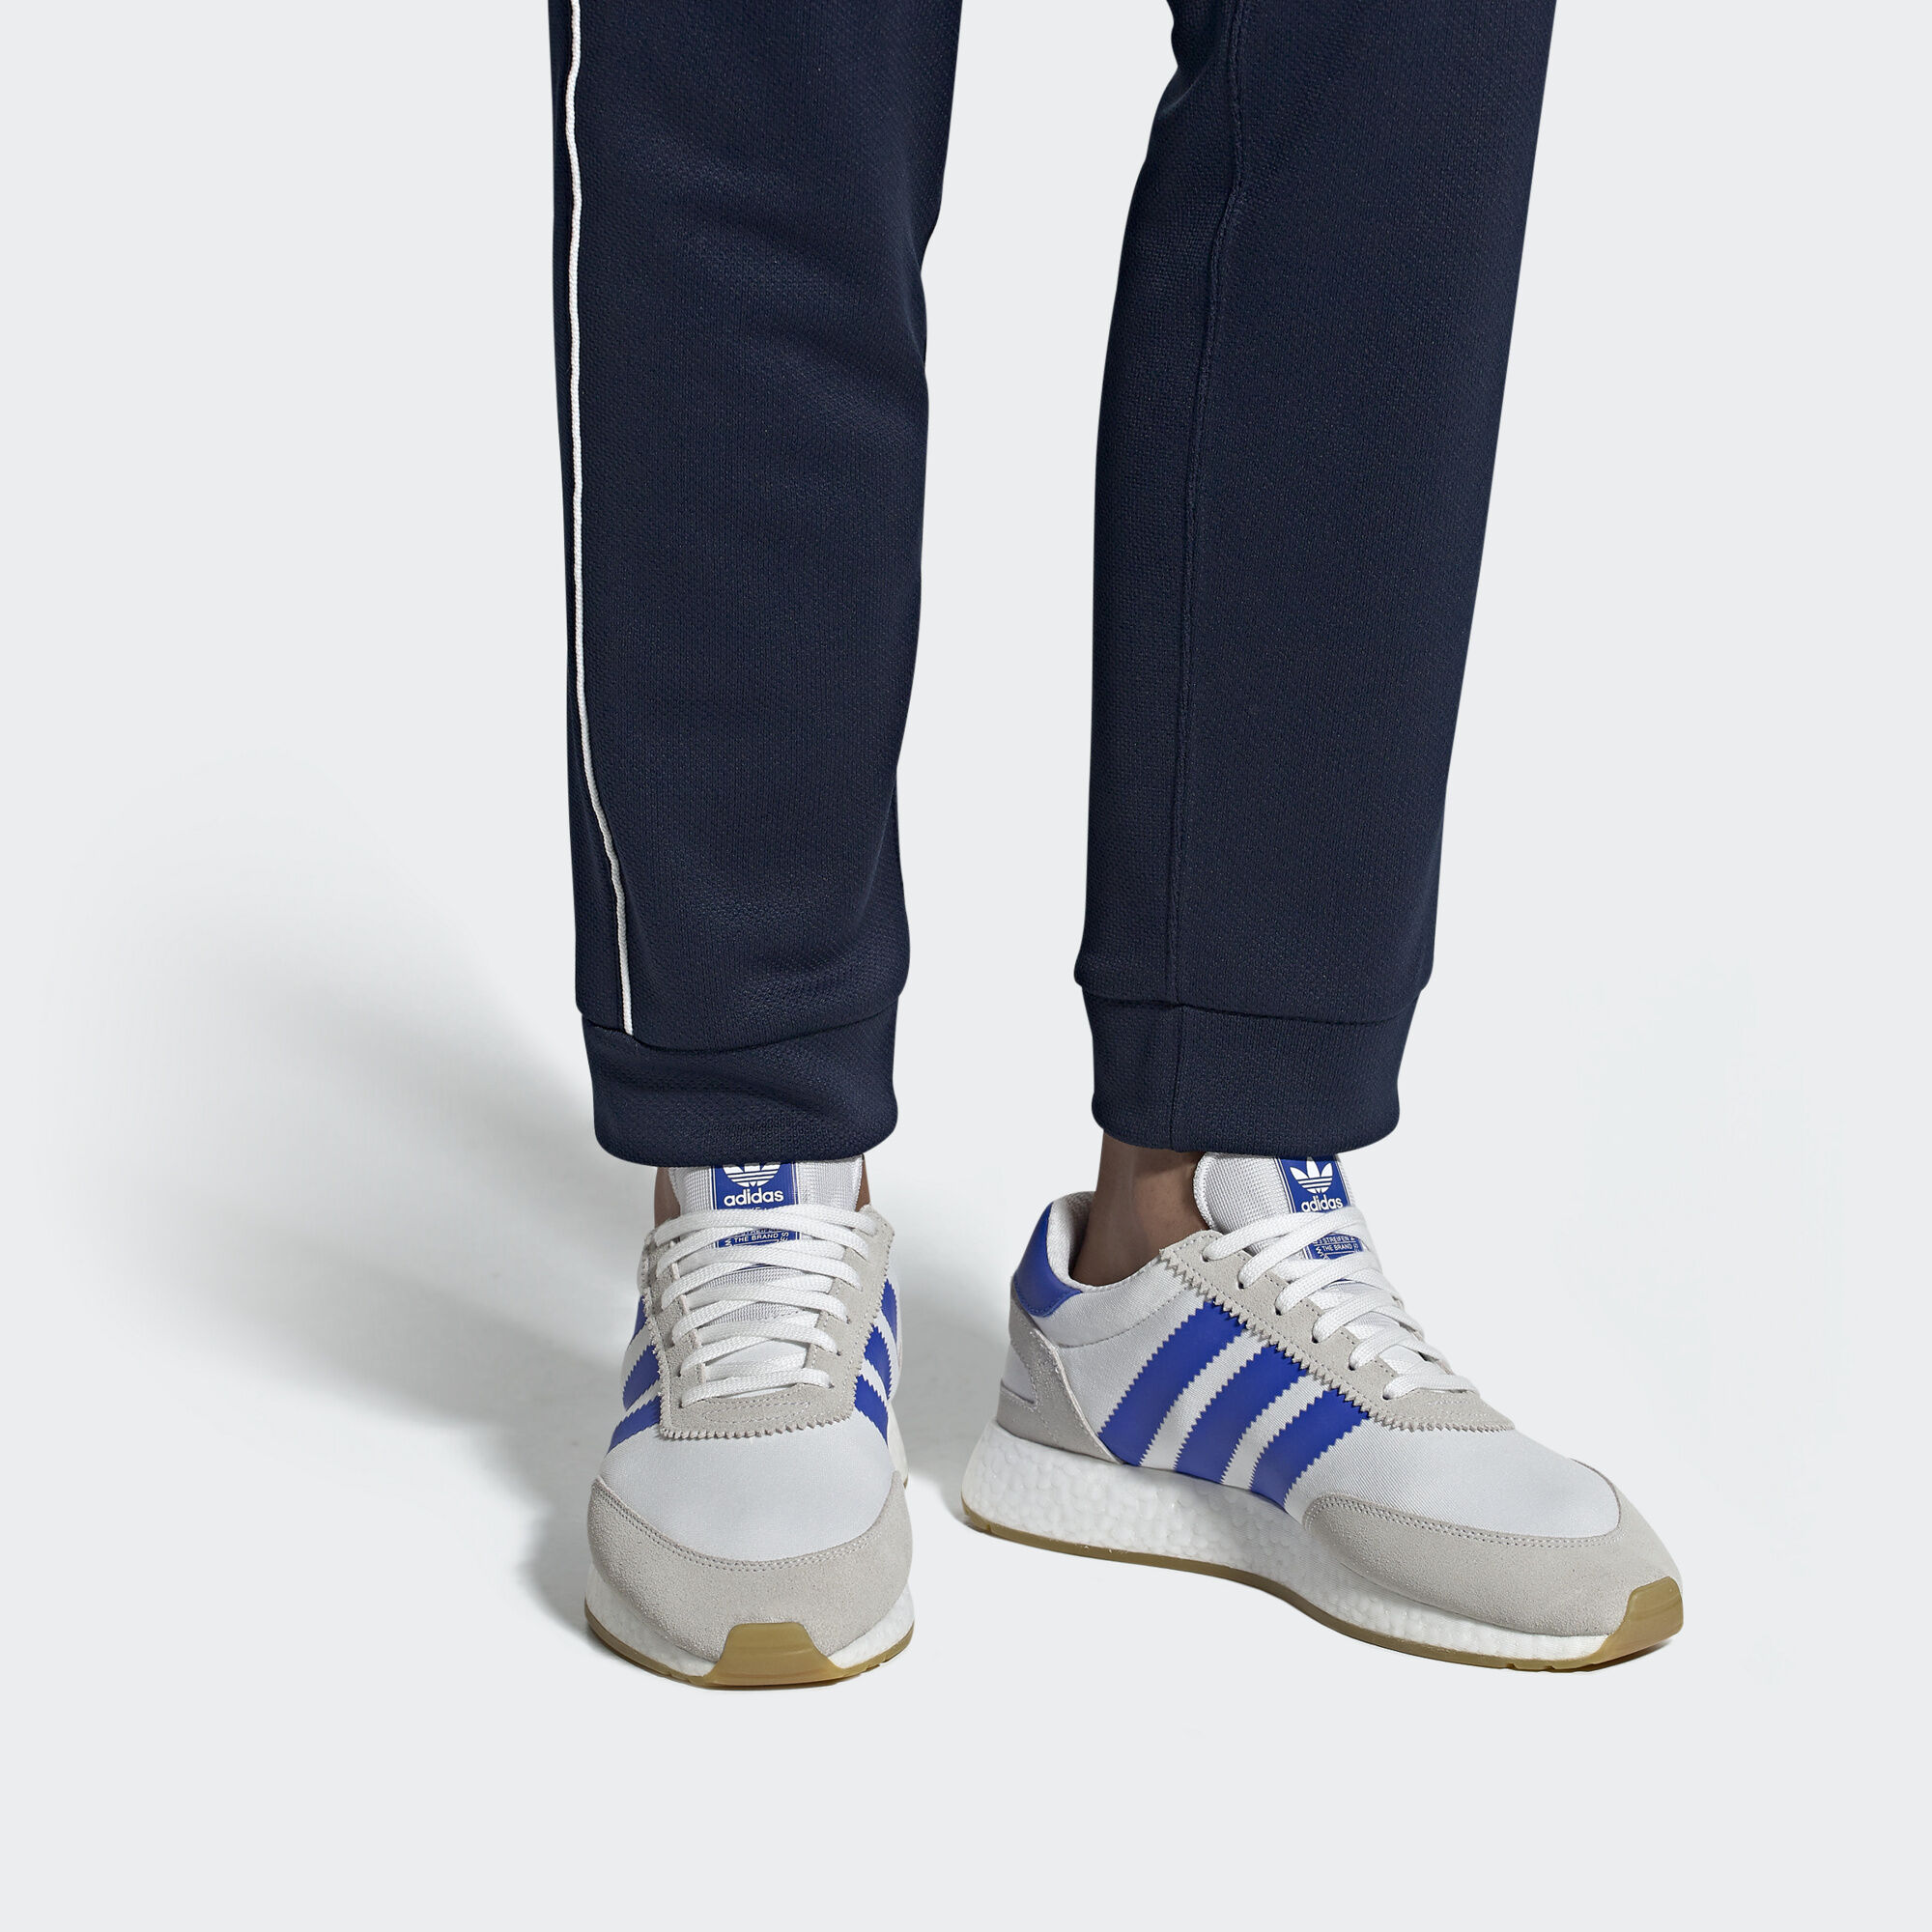 3e63a2b76a49c1 adidas I-5923 Shoes - Blue